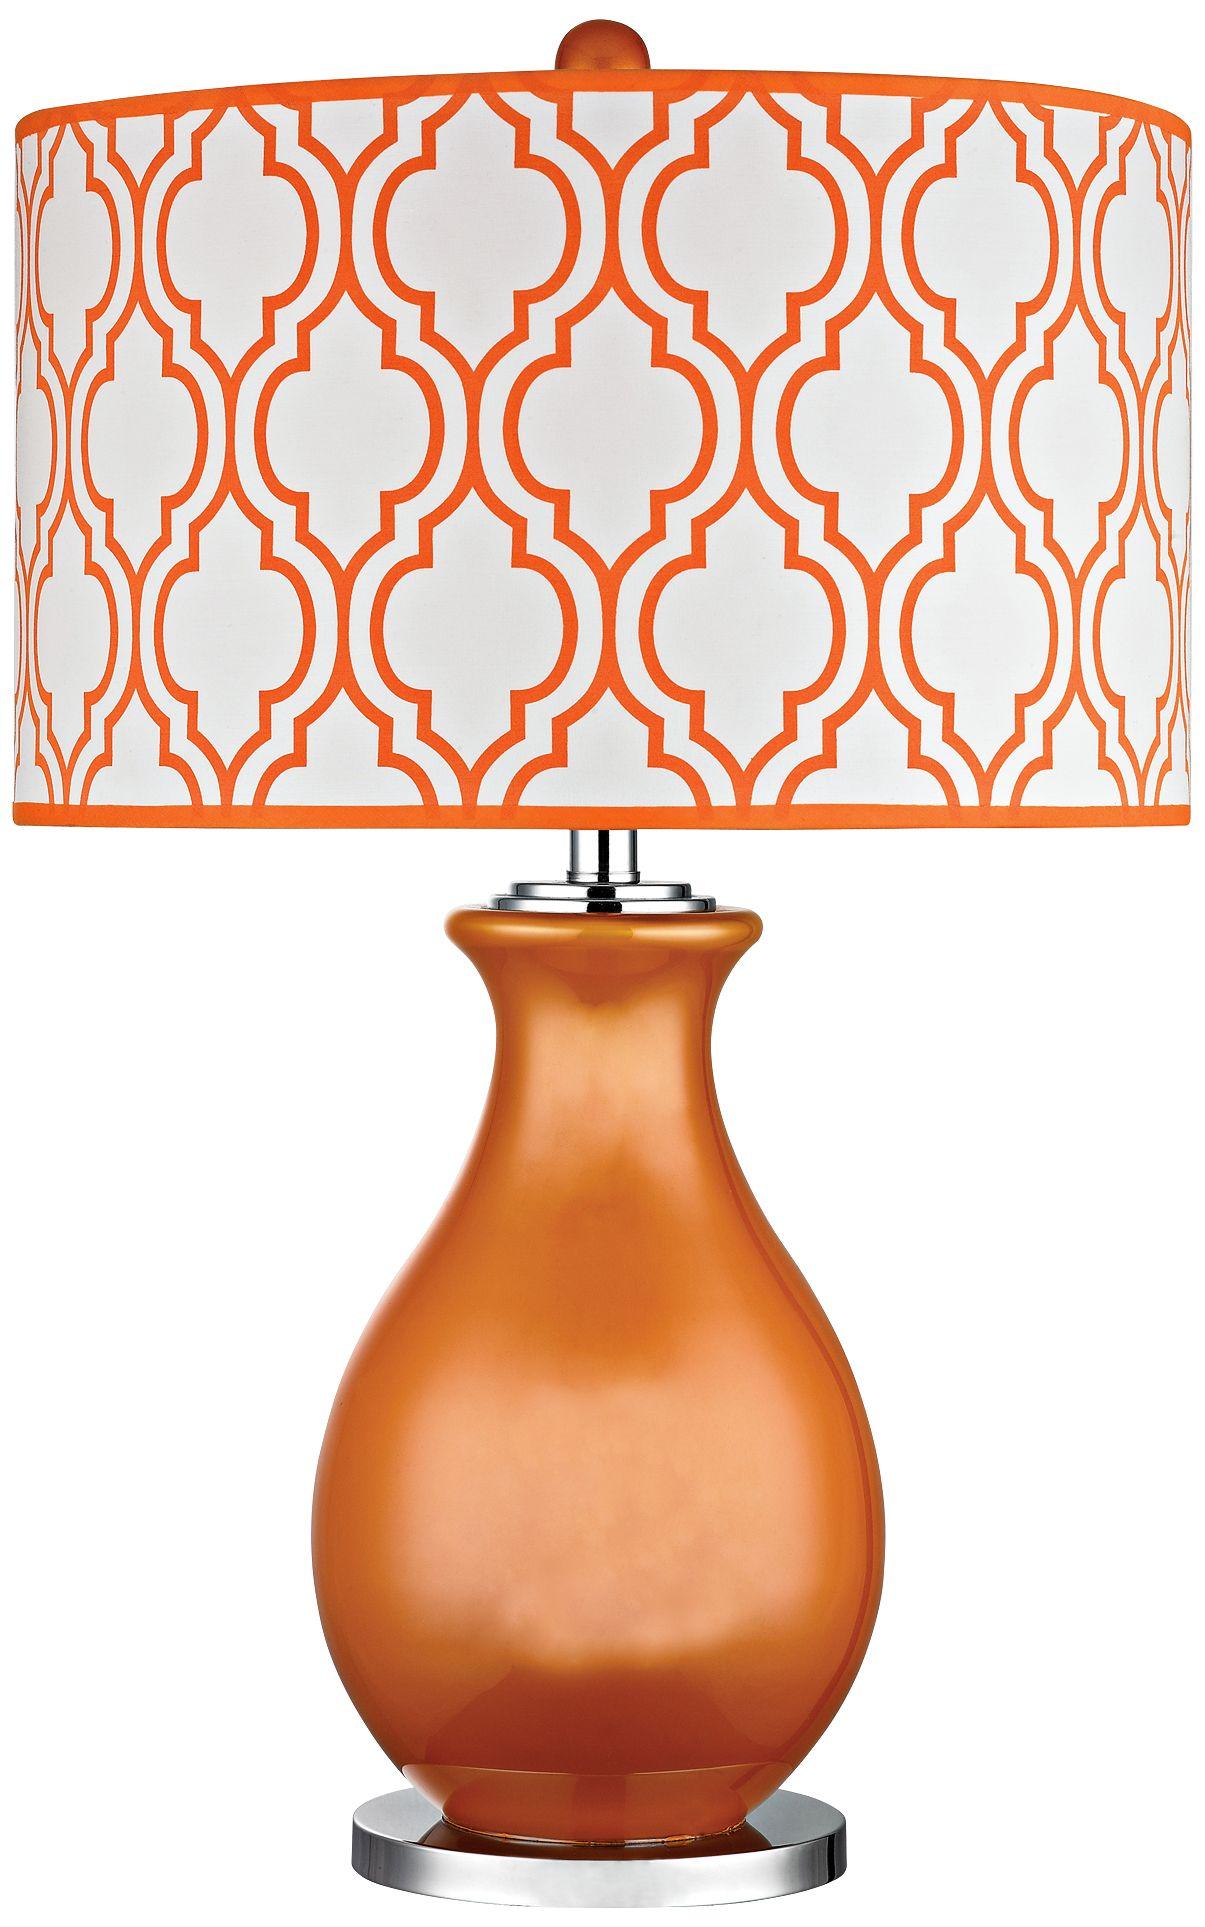 Delightful Dimond Thatcham Tangerine Orange Glass Table Lamp